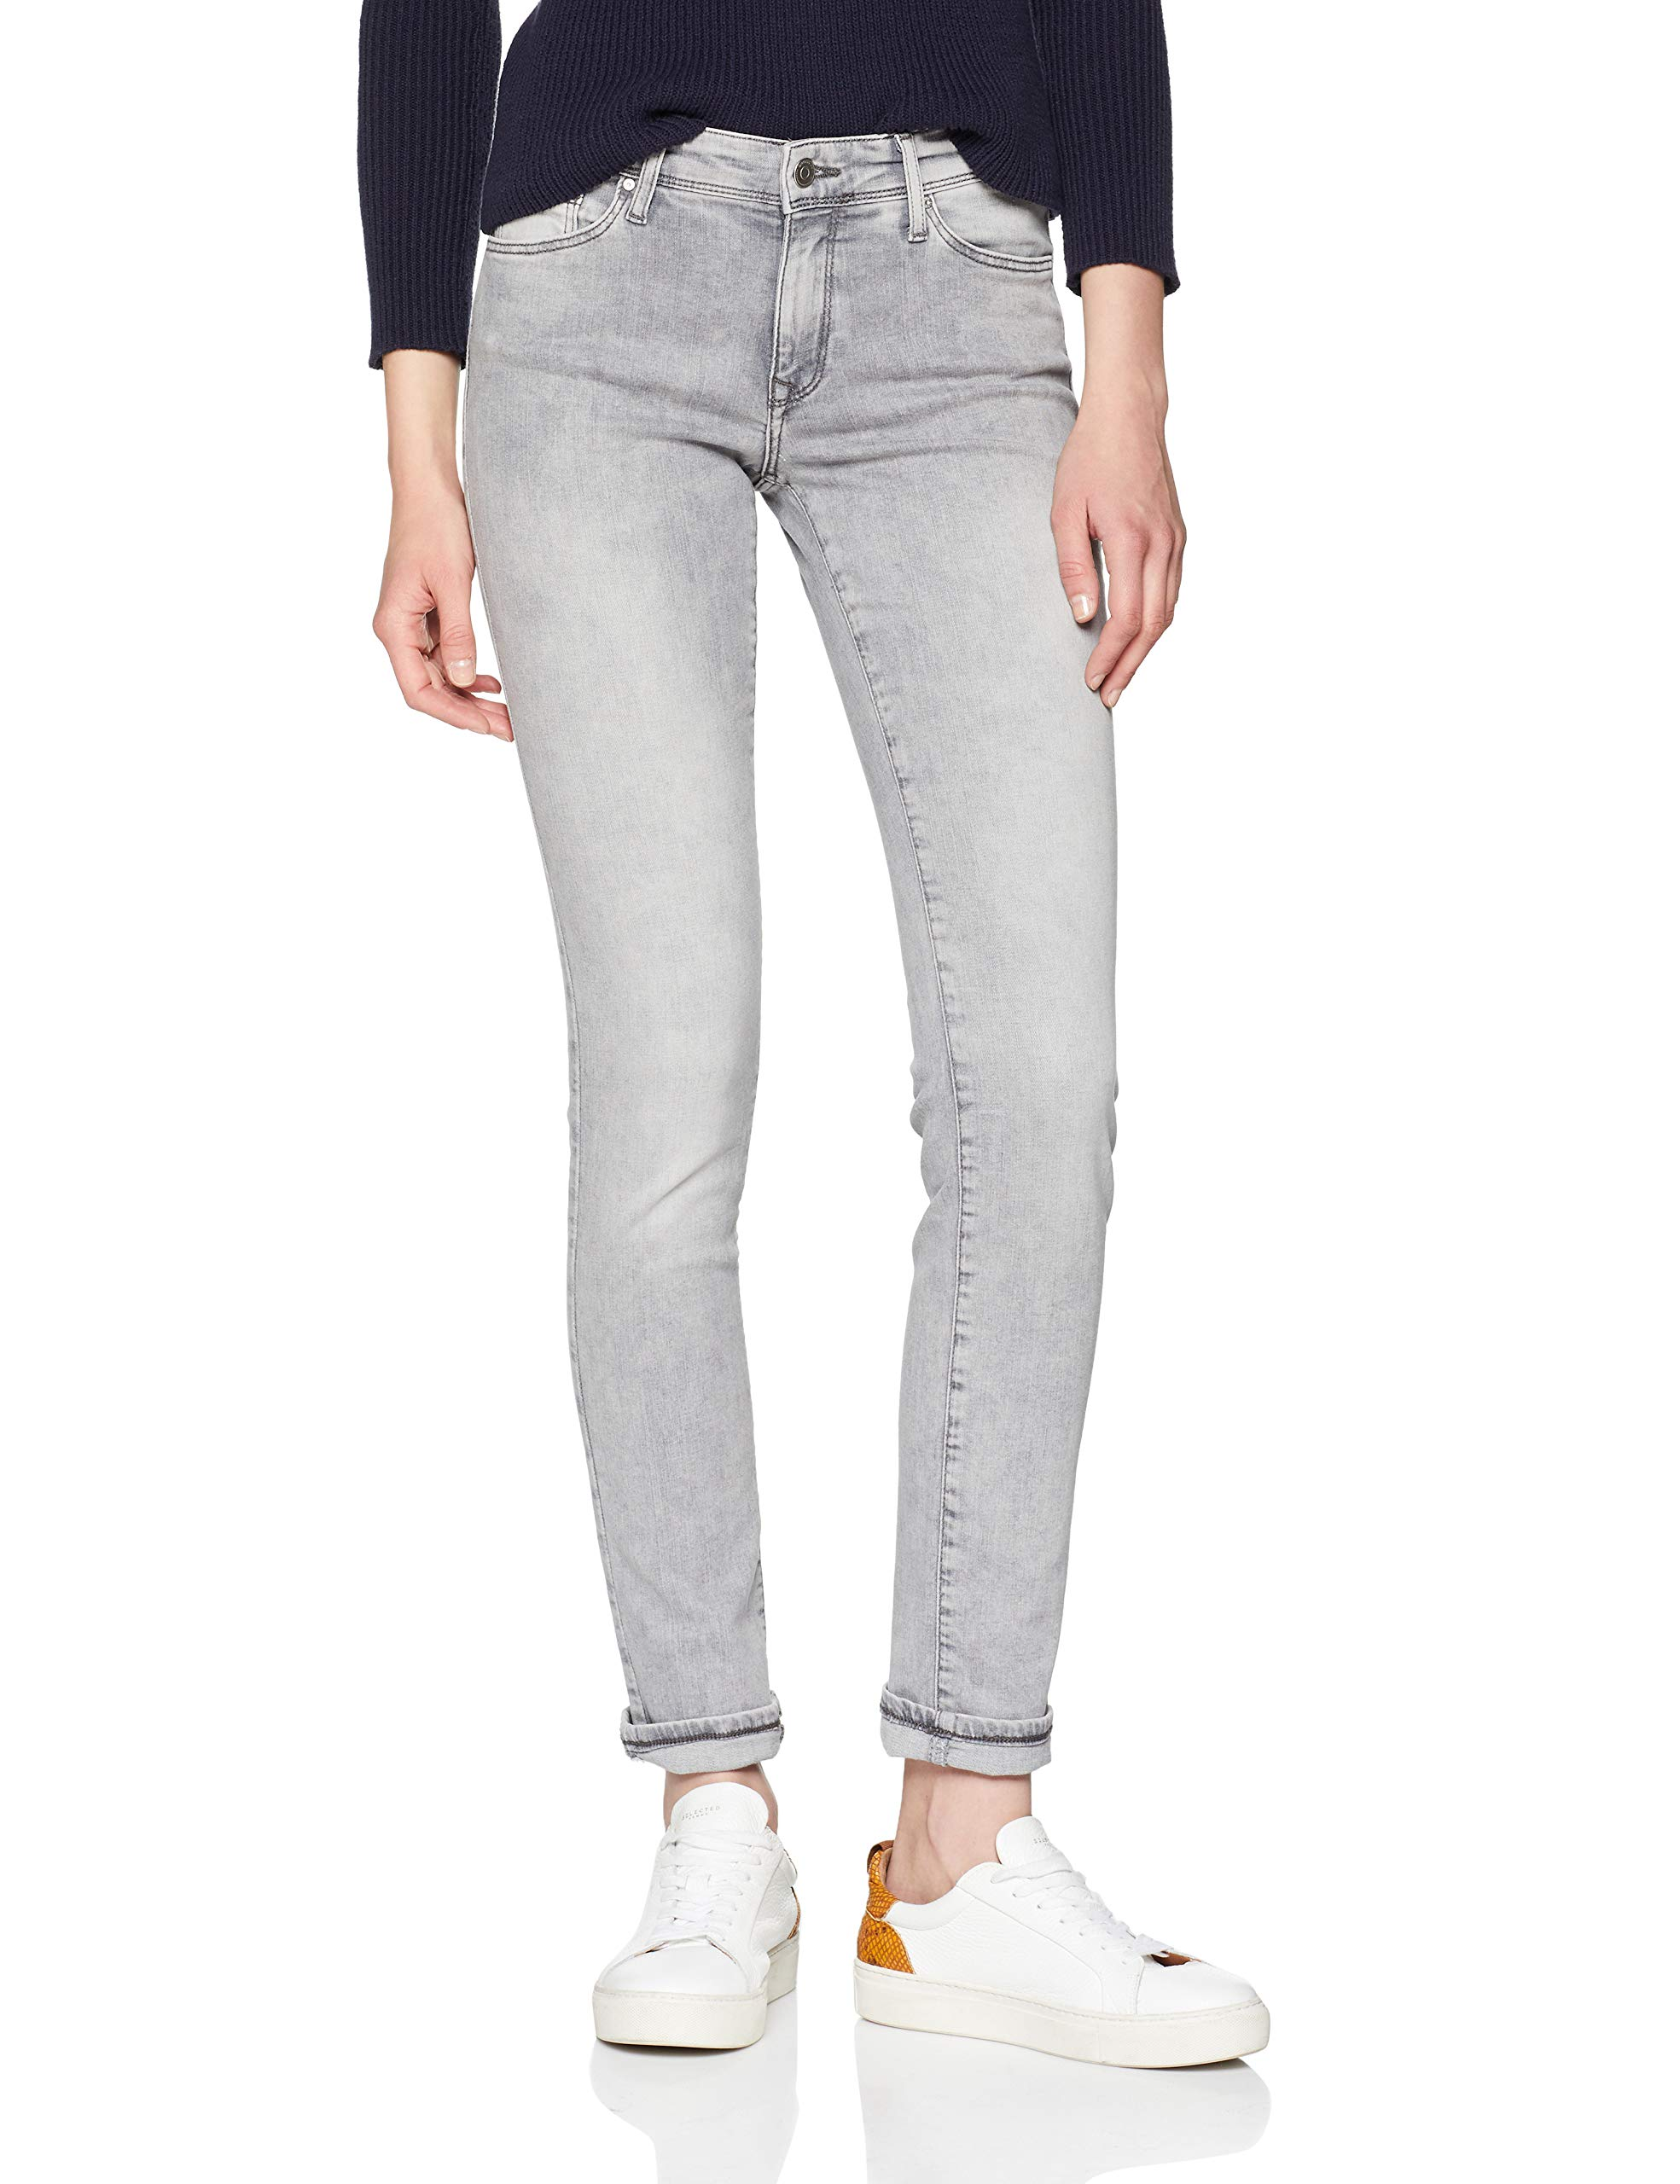 34Femme Anya SlimGrissmoky Cross Grey Jeans Light Jean Fabricant30 151W30 l34taille T3F1JlKc